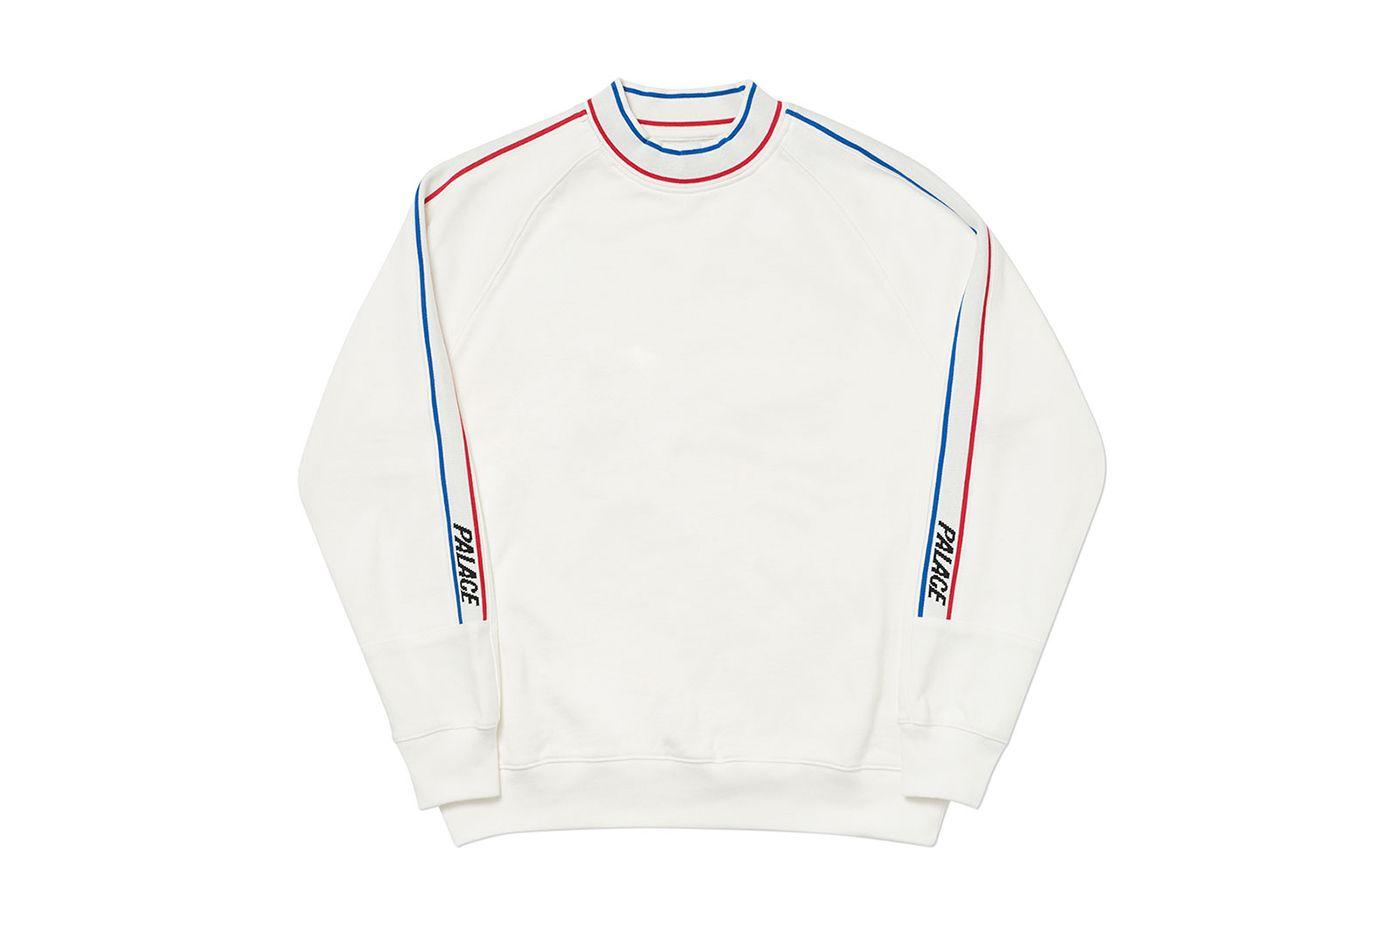 Palace 2019 Summer Sweatshirts Summer Sweatshirt Sweatshirts Cool Outfits [ 933 x 1400 Pixel ]